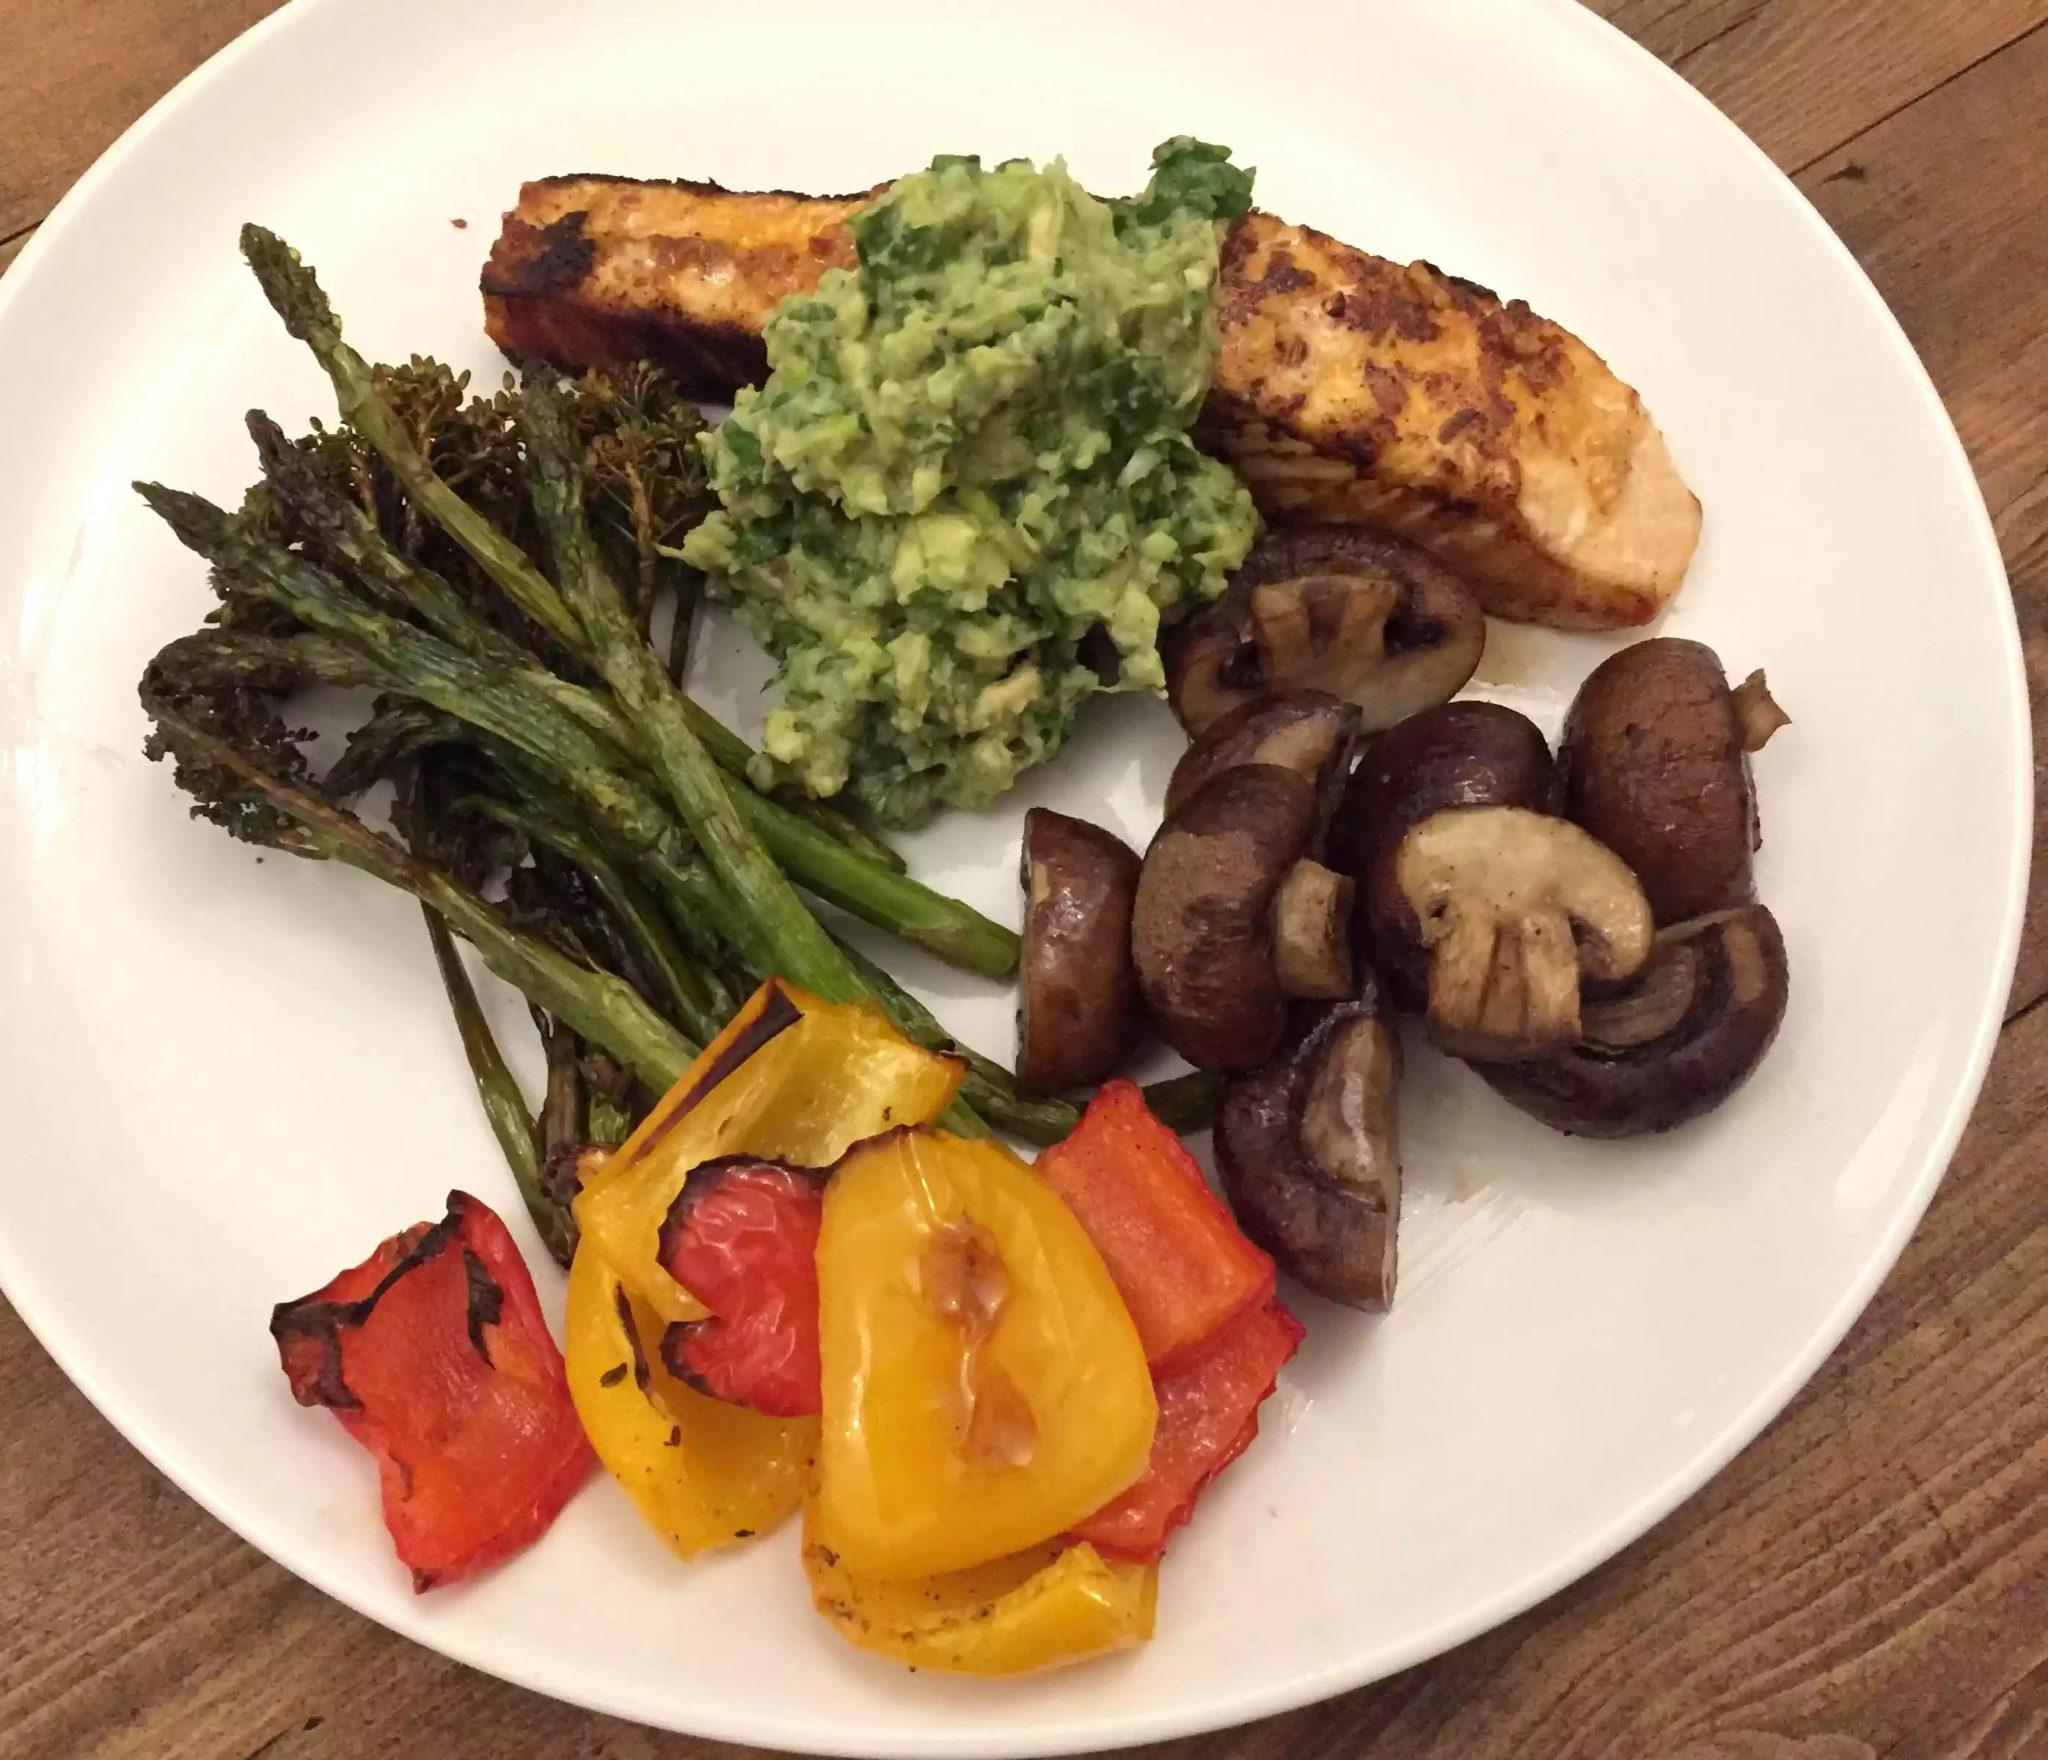 Pan-Fried Harissa Salmon Fillets with Avocado Salsa - Emma Eats & Explores